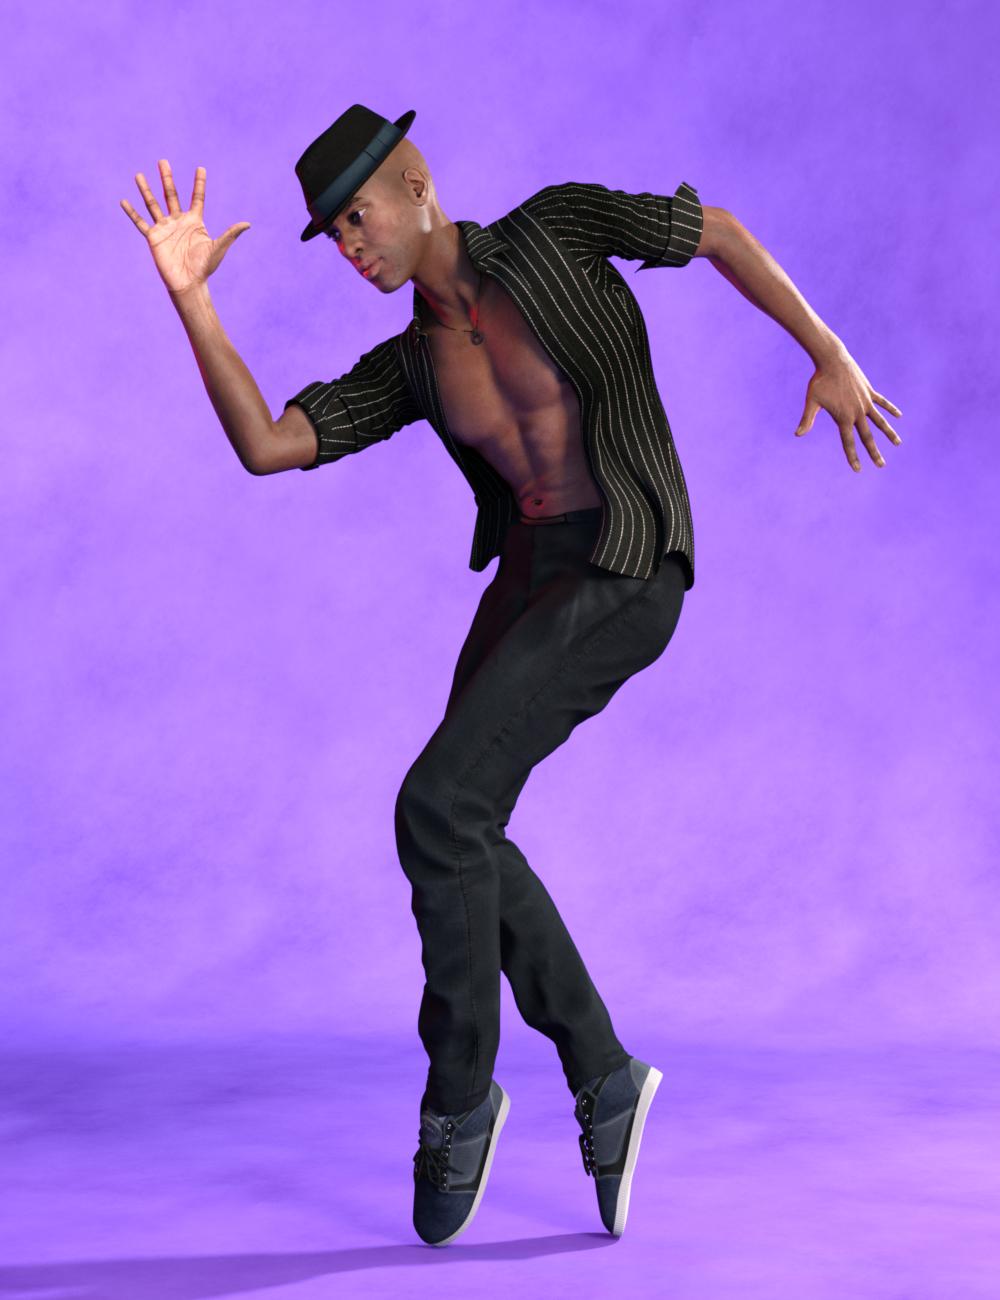 Expressive Dancer Poses for Genesis 8 Male by: Vyusur, 3D Models by Daz 3D